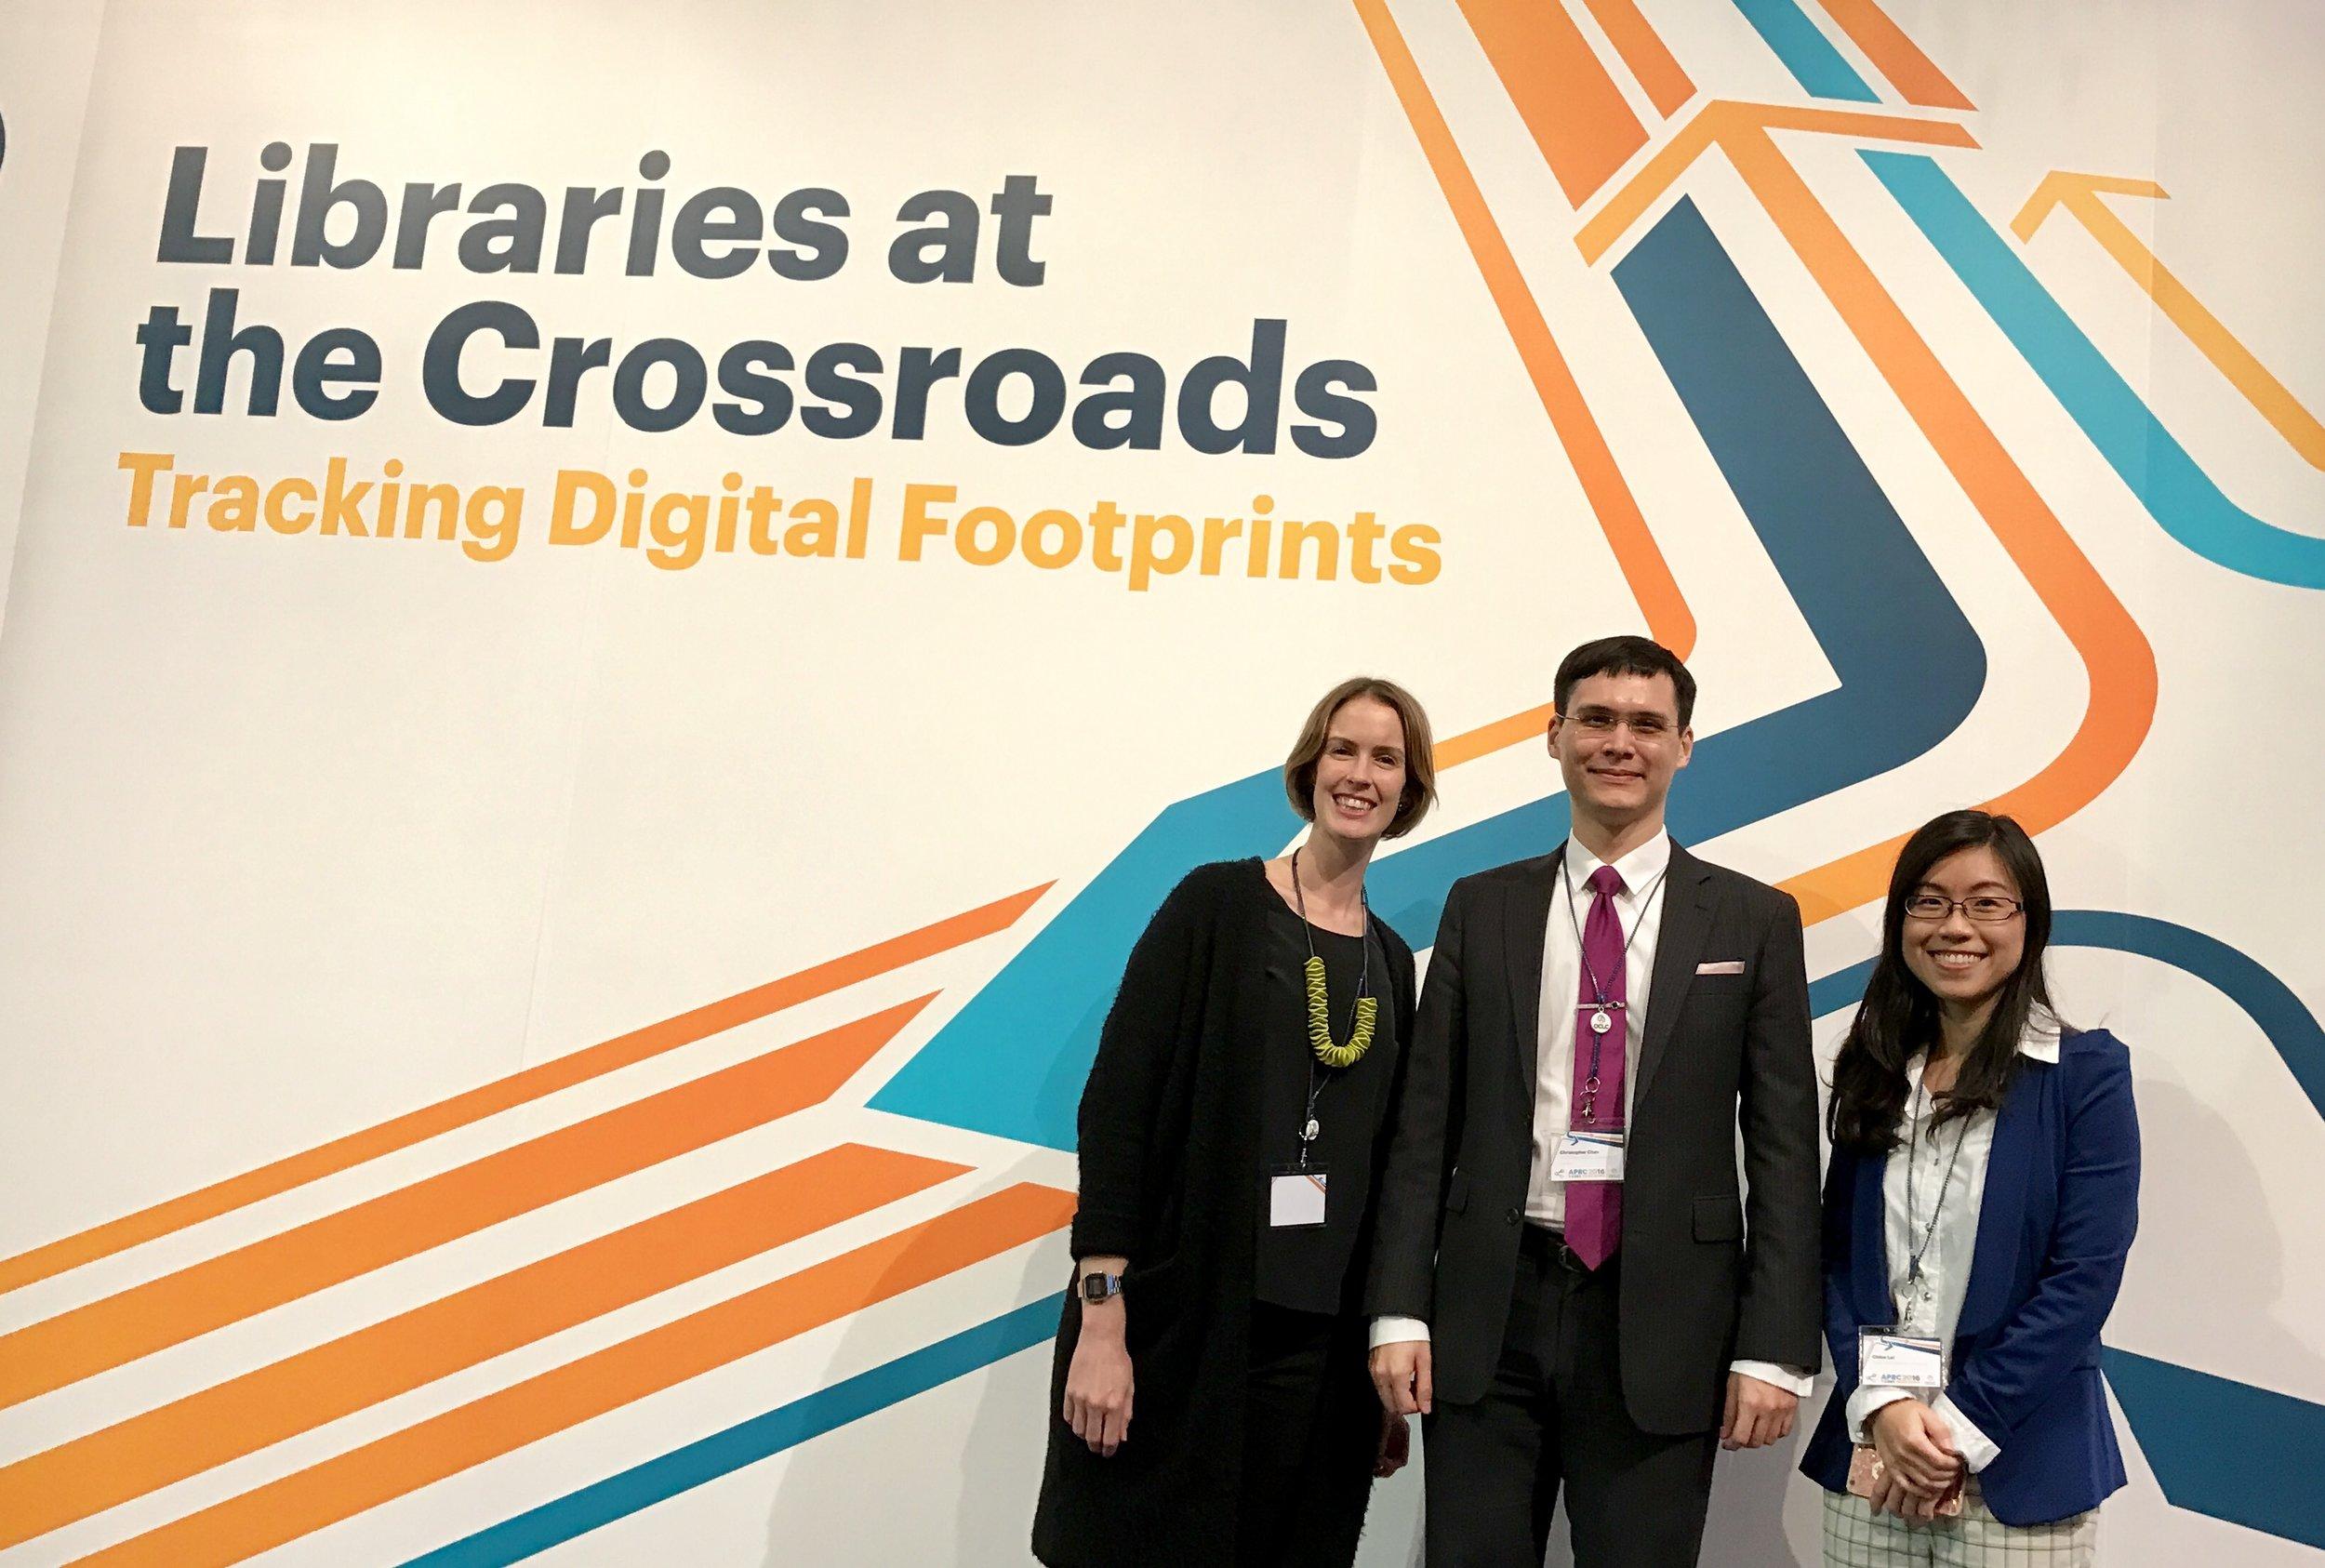 HKLC representing at OCLC!! Thanks Lolita Kwok for taking the photo :-)